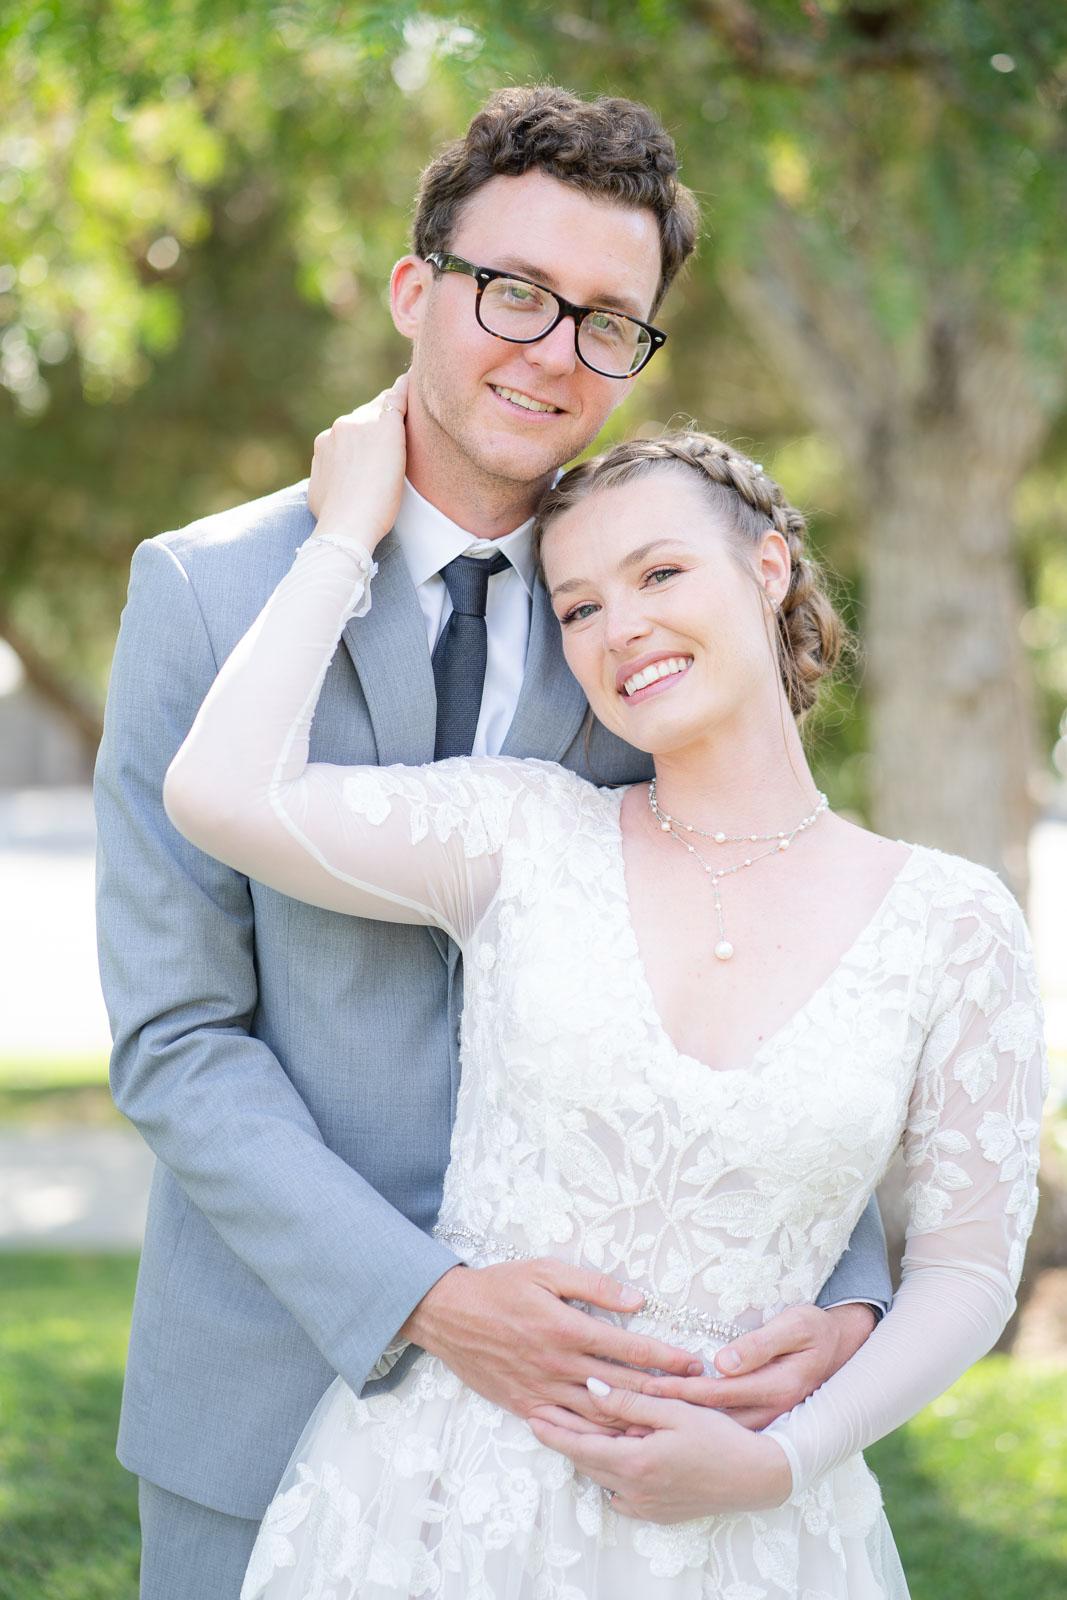 bride and groom cute pose